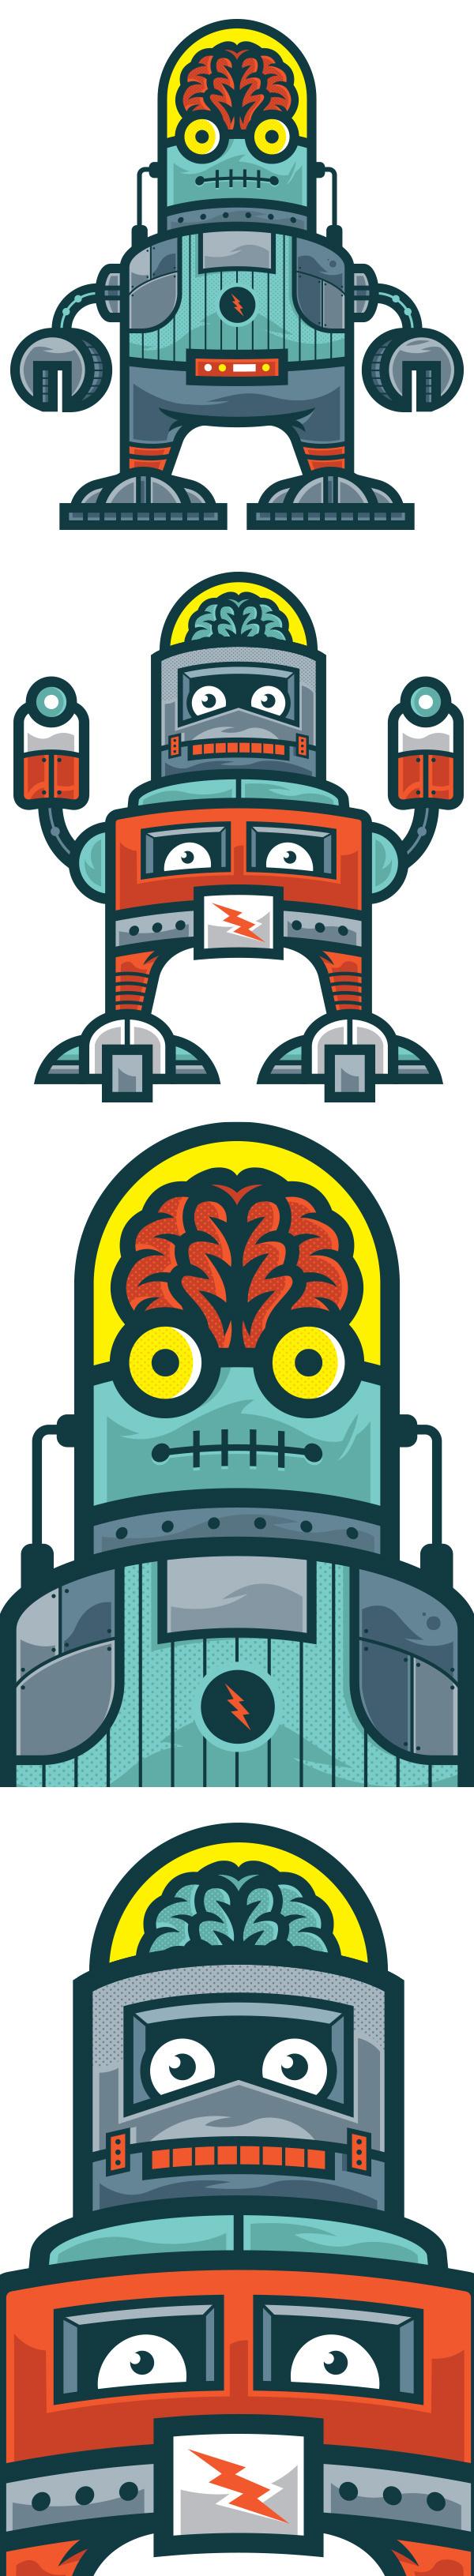 BrainBot Kids Danger Brain #robots